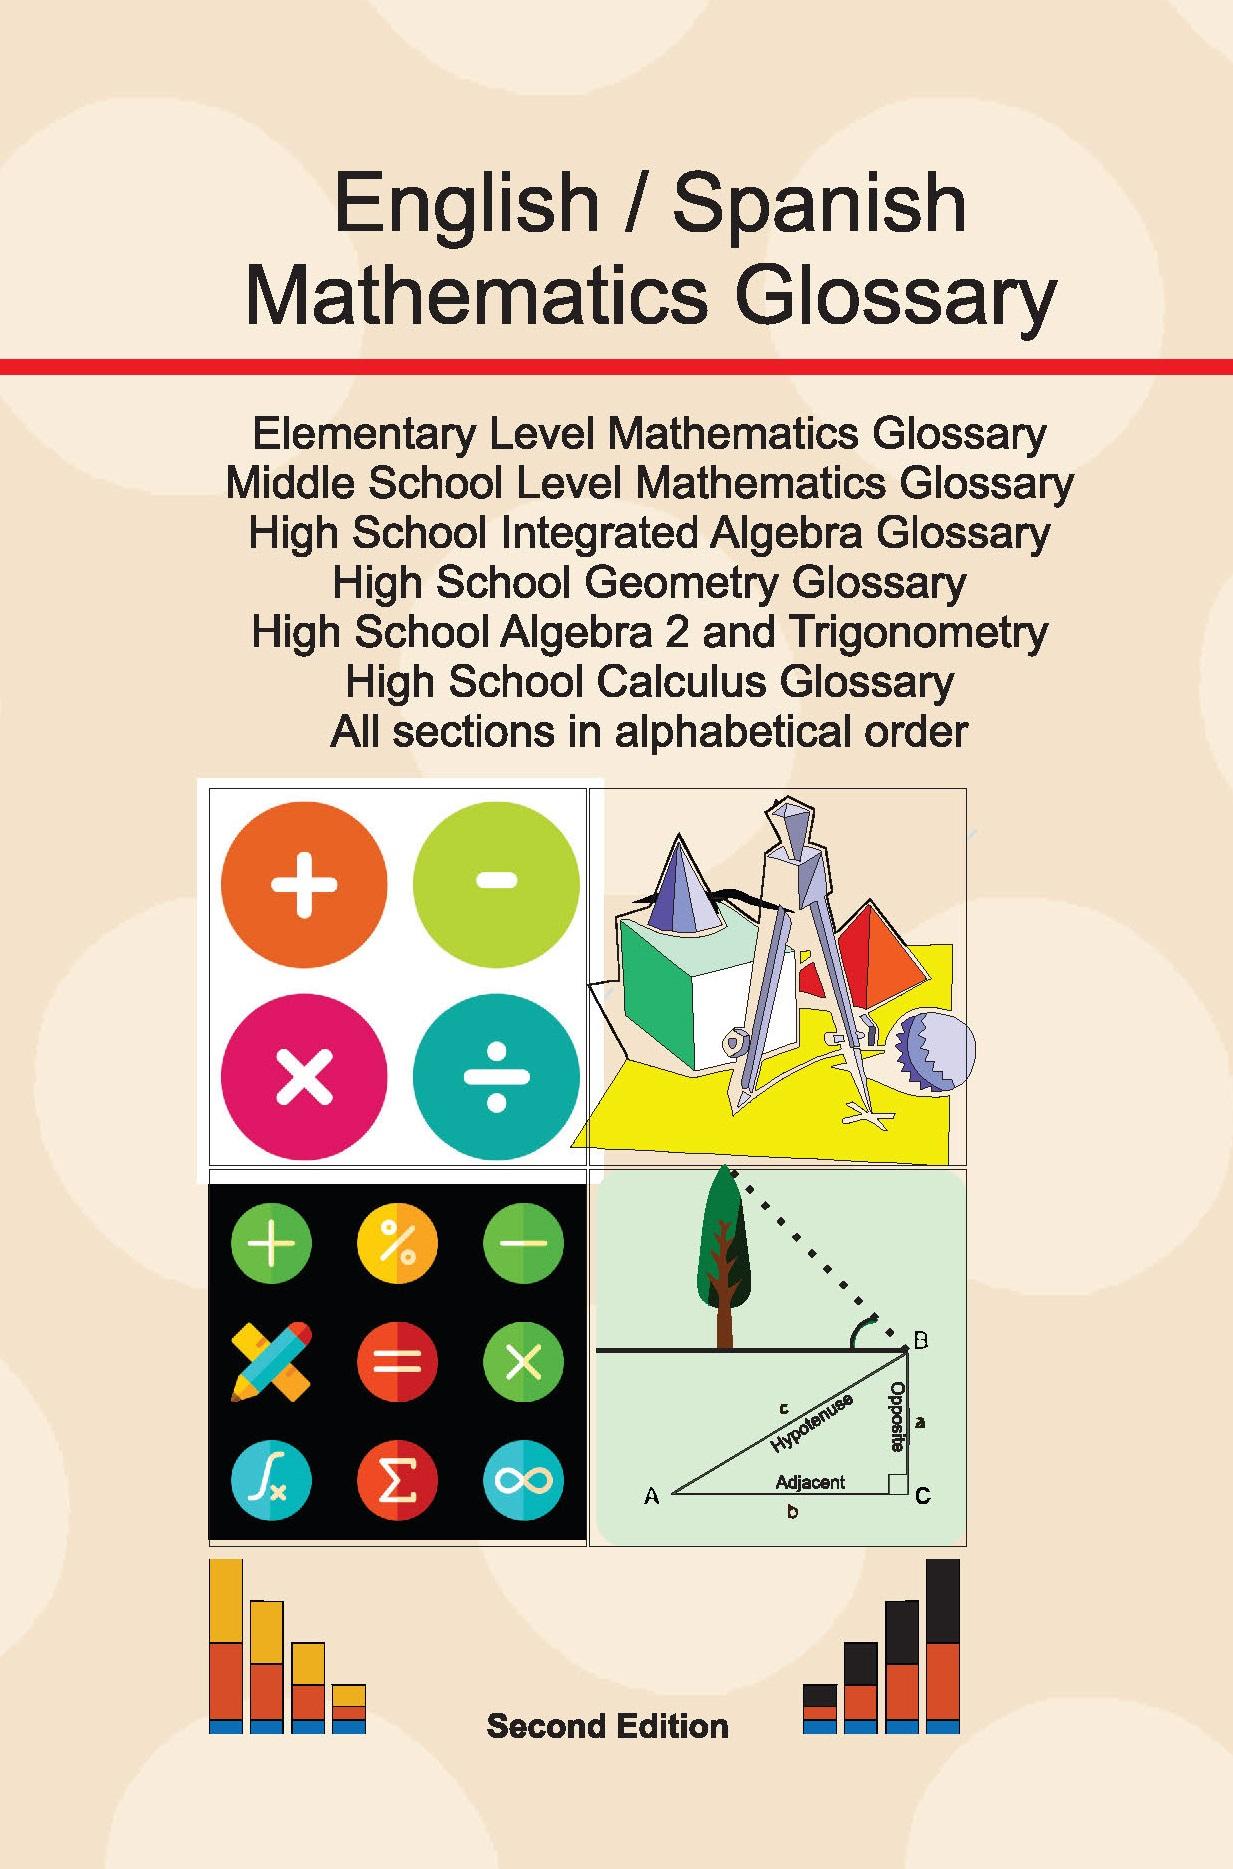 Mathematics Glossary  English/Spanish  Elementary, Middle School and High School Level.